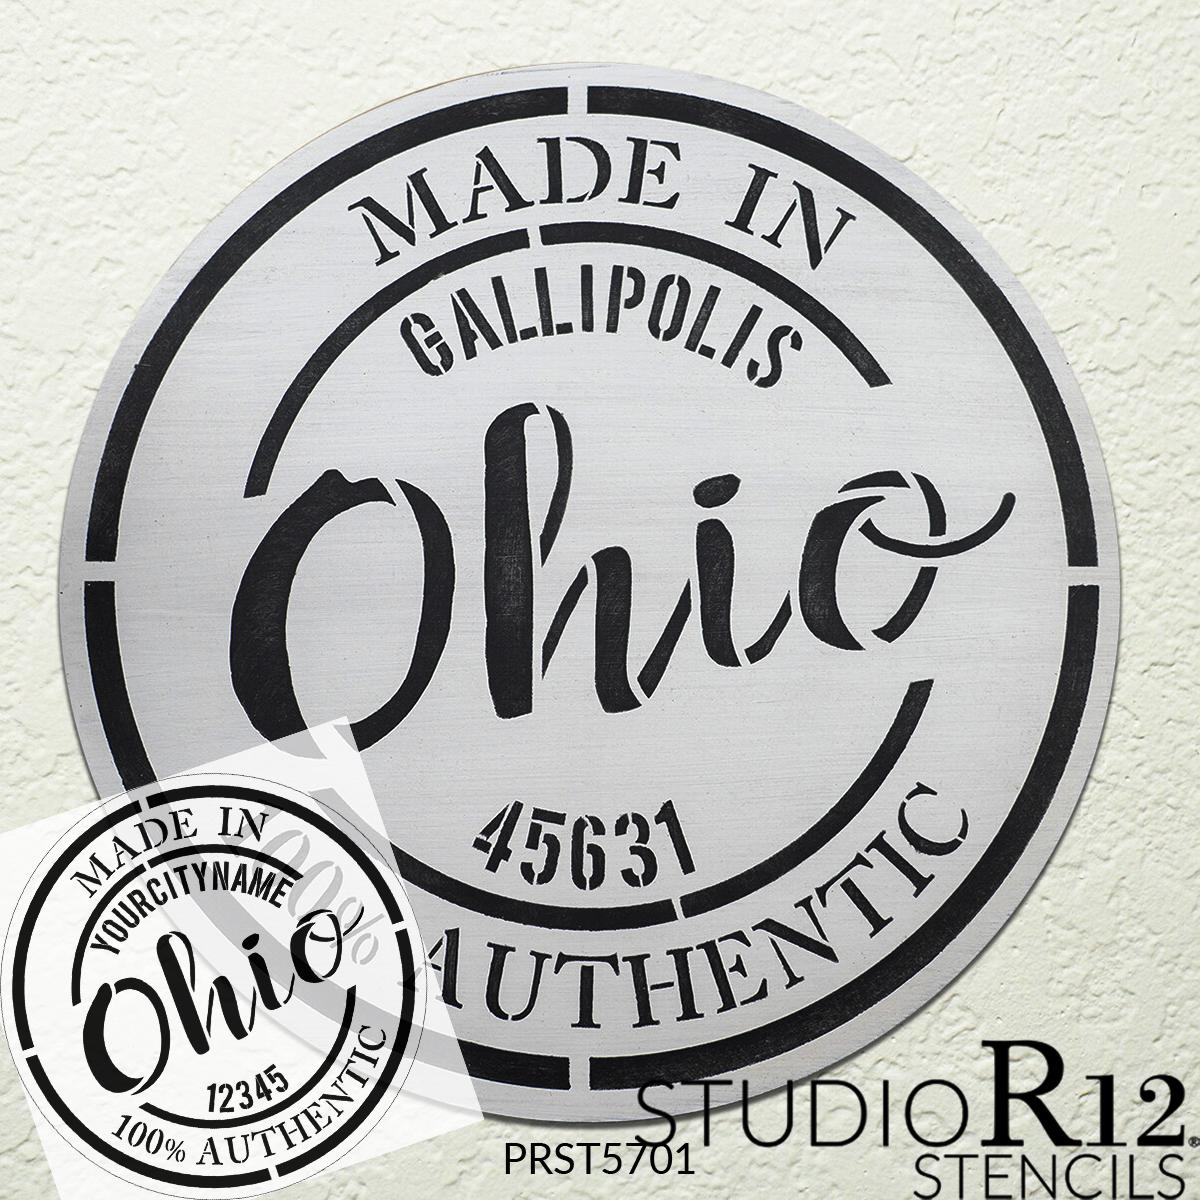 5701-ohio-stamp-white-backgroundwith-stencil-sku-r12.jpg